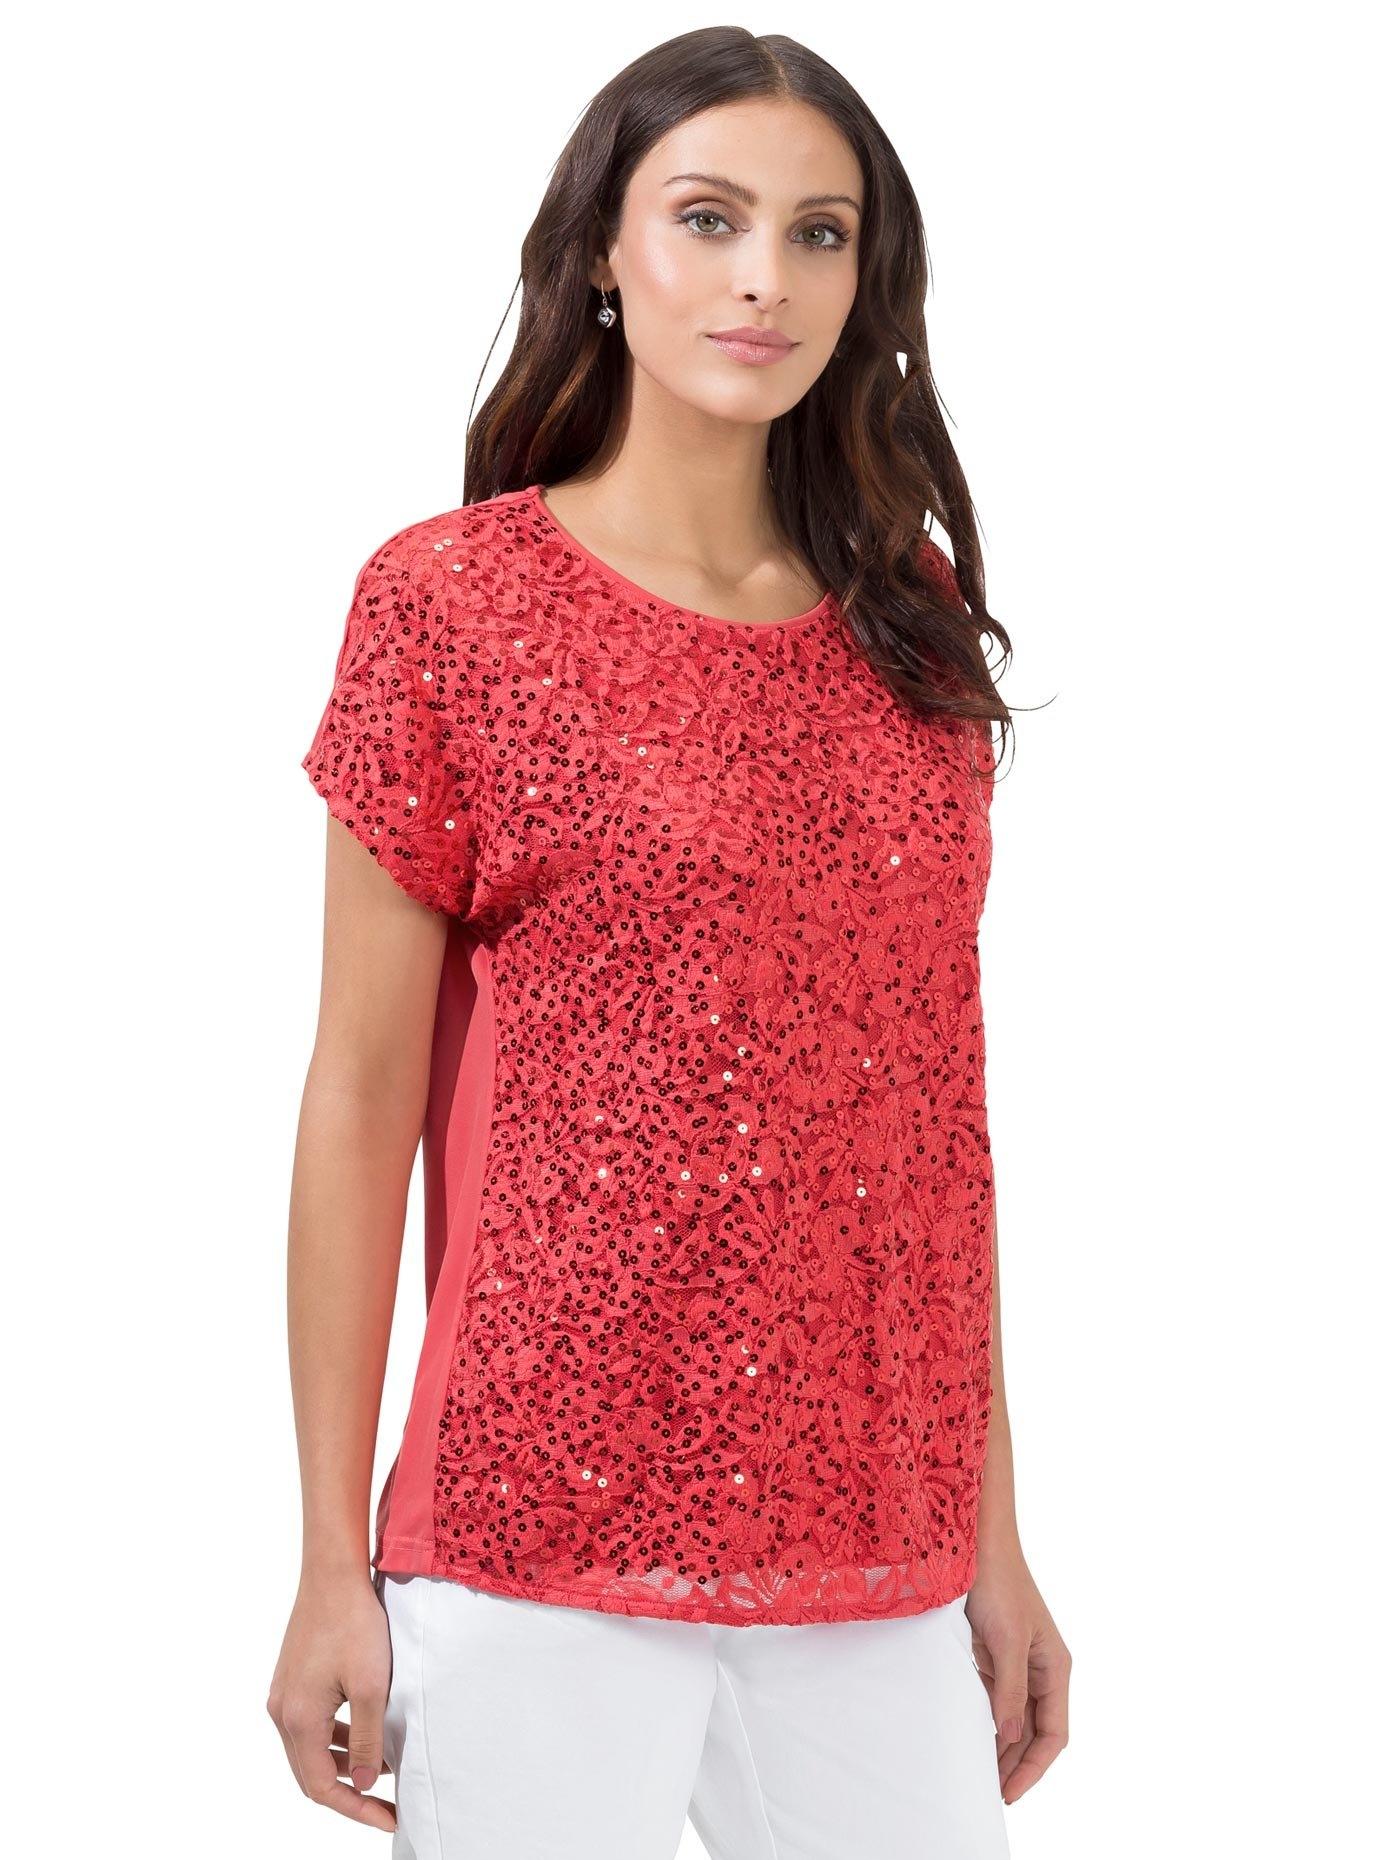 Lady kanten shirt bij OTTO online kopen